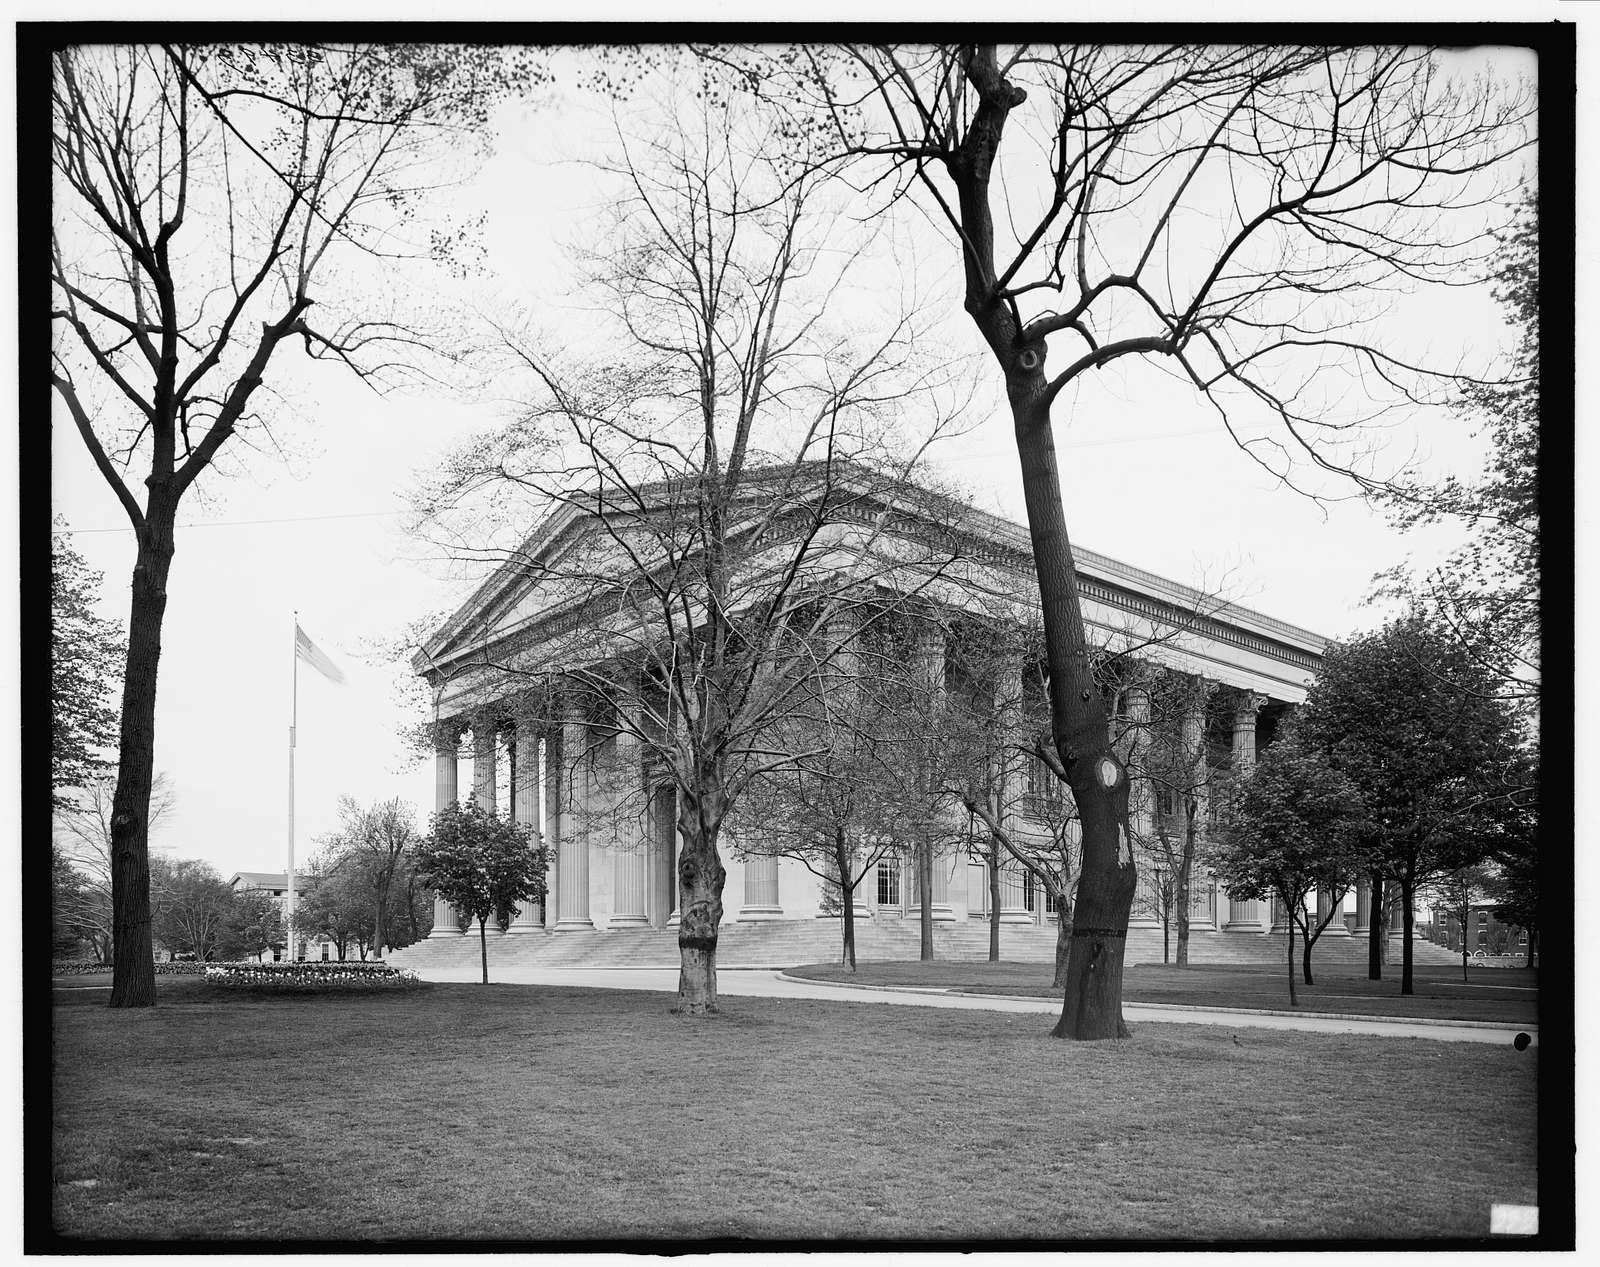 Main Building, Girard College, Philadelphia, Pa.